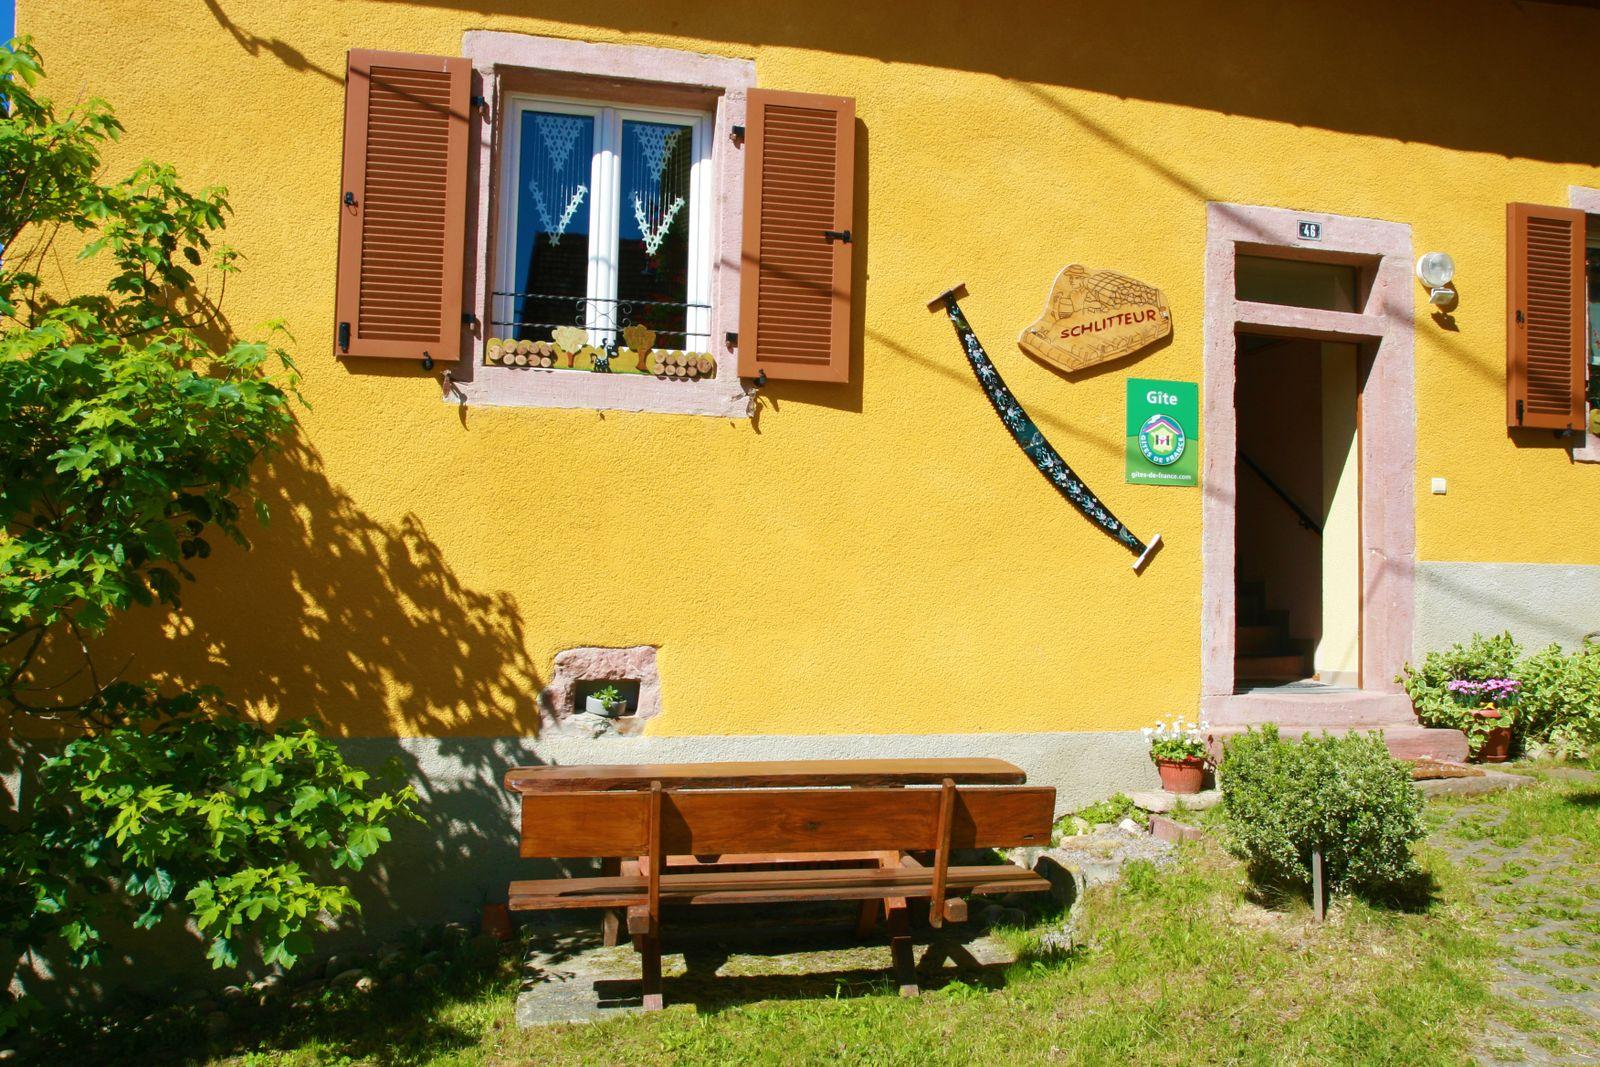 Location Gîte à Breitenbach Bas Rhin Gîtes De France Alsace Bas Rhin